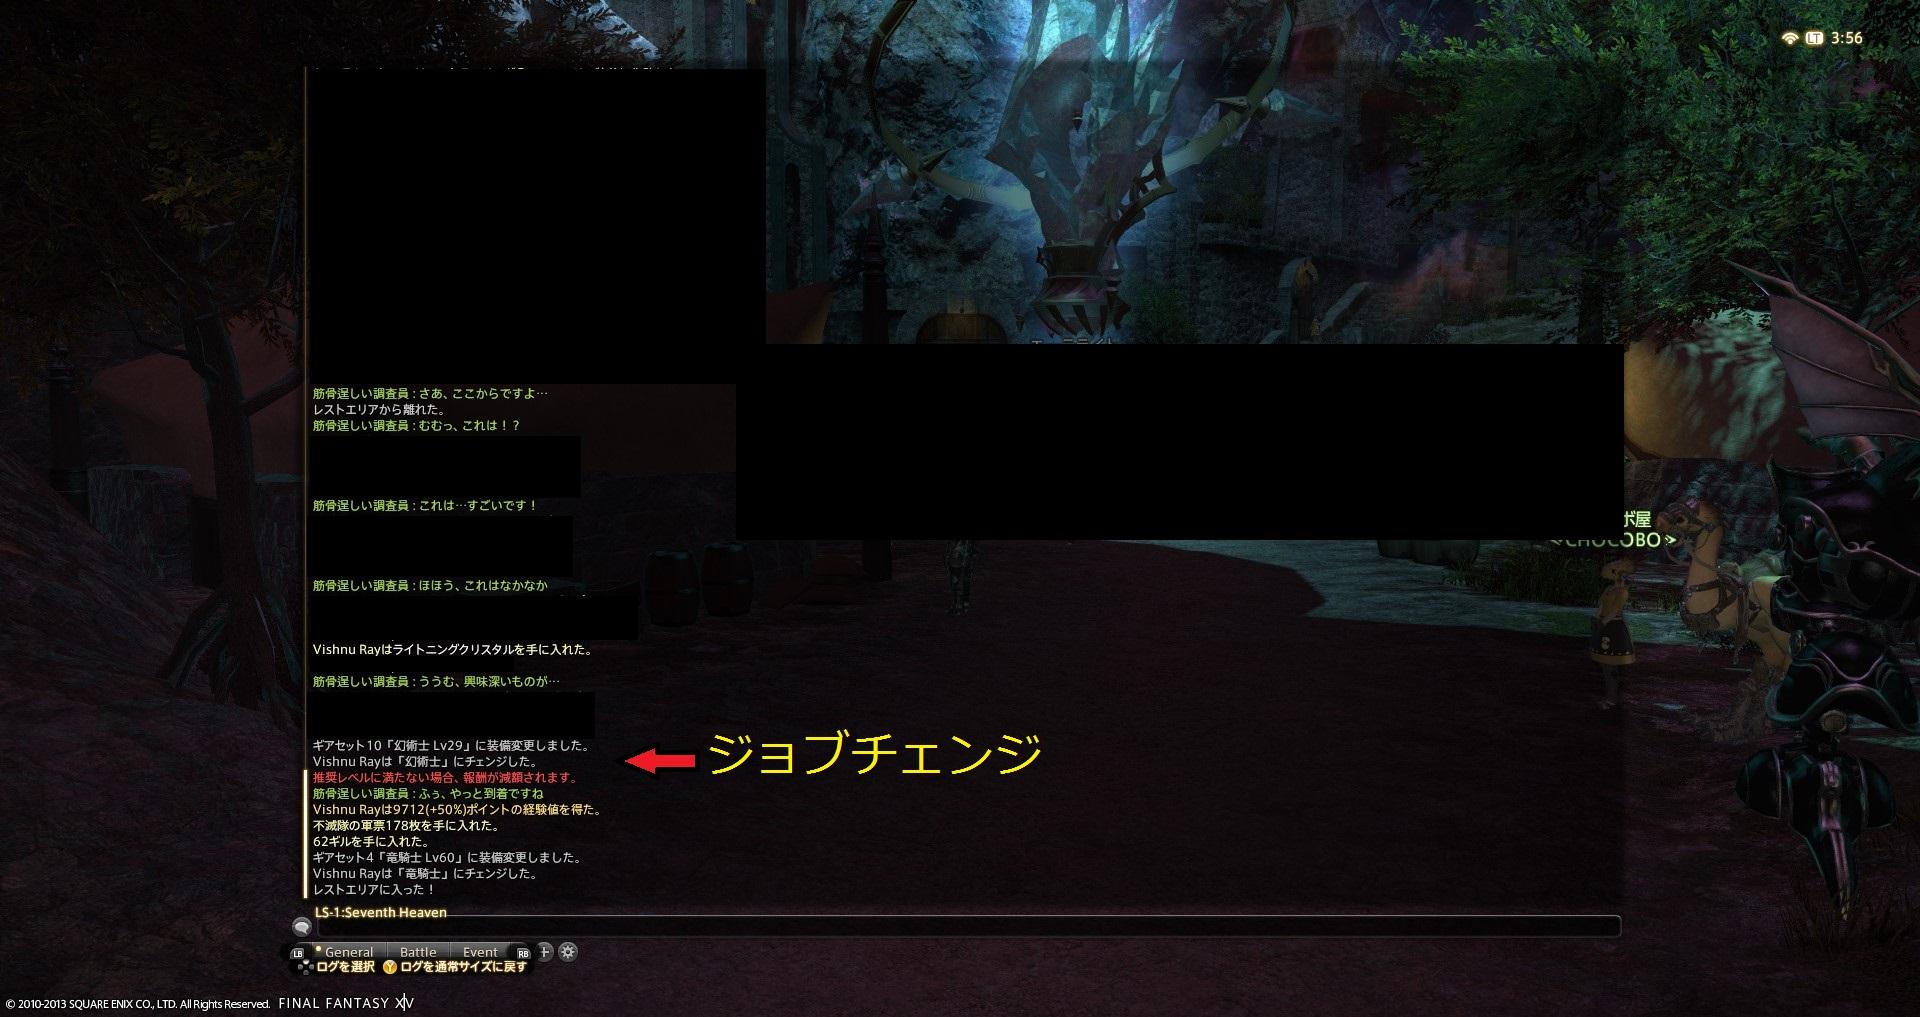 20130930FF14001.jpg